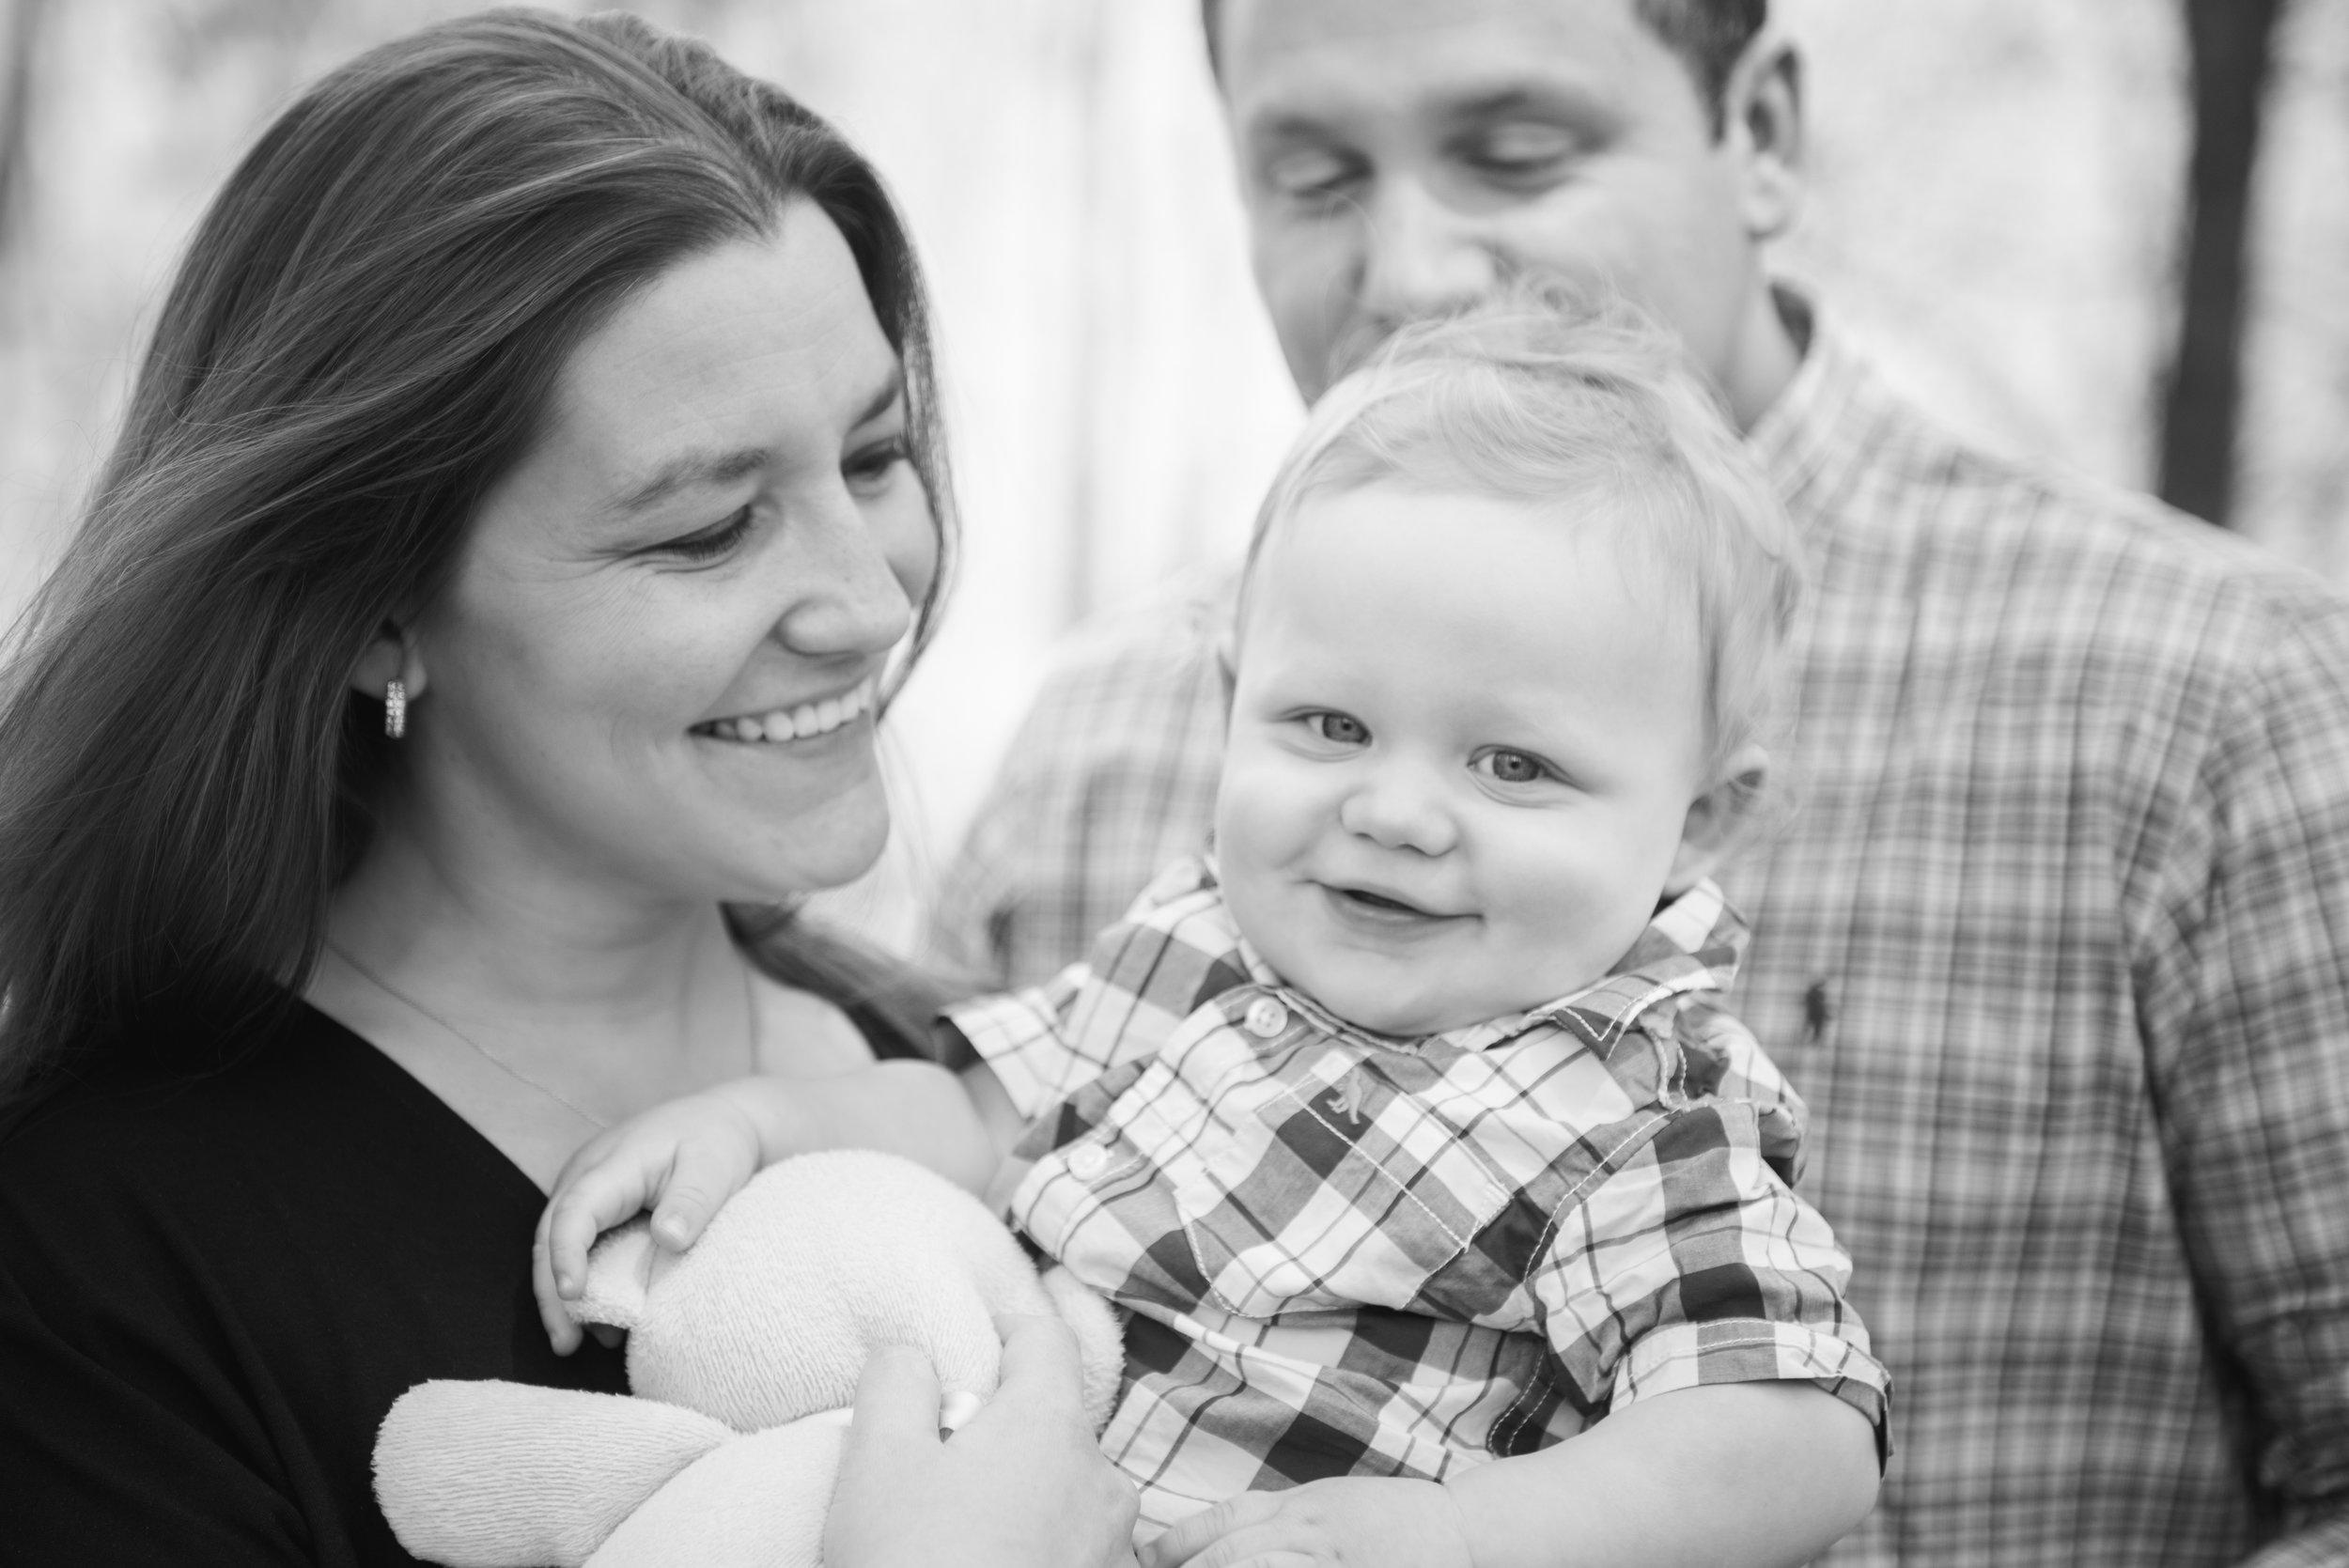 CT Family Photographer | Baby Family Session | Heather & Sarah Photography | www.heatherandsarahphoto.com